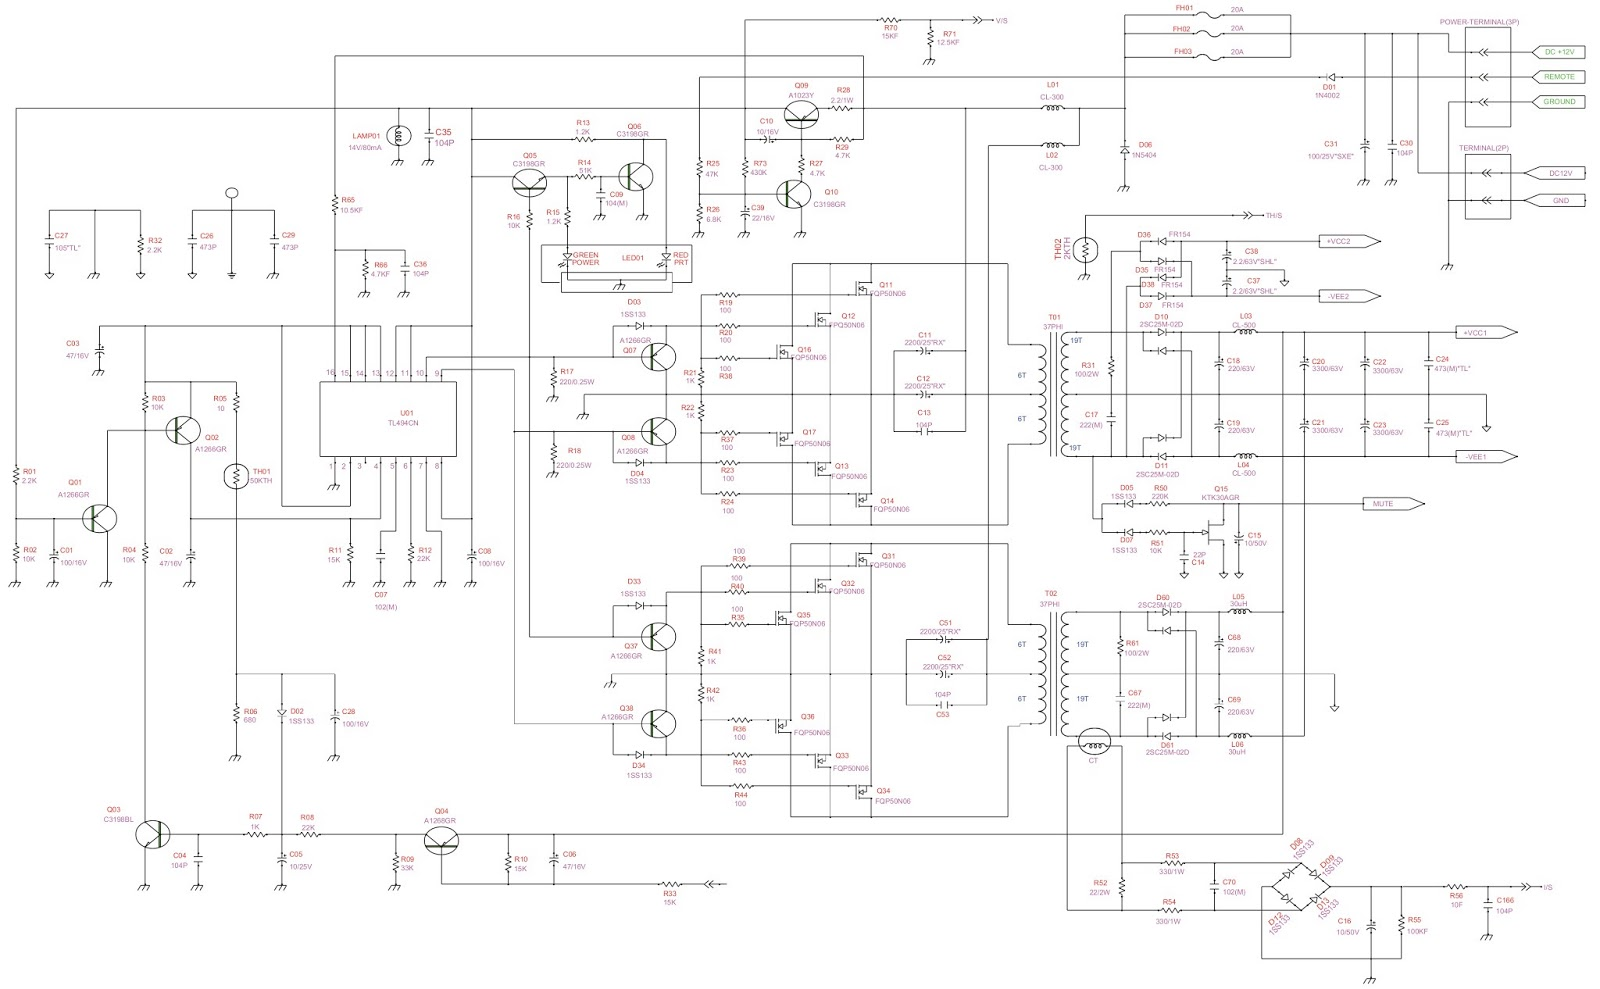 small resolution of manualguide alpine 2 channel amp wire diagram rh whizenterprise co uk